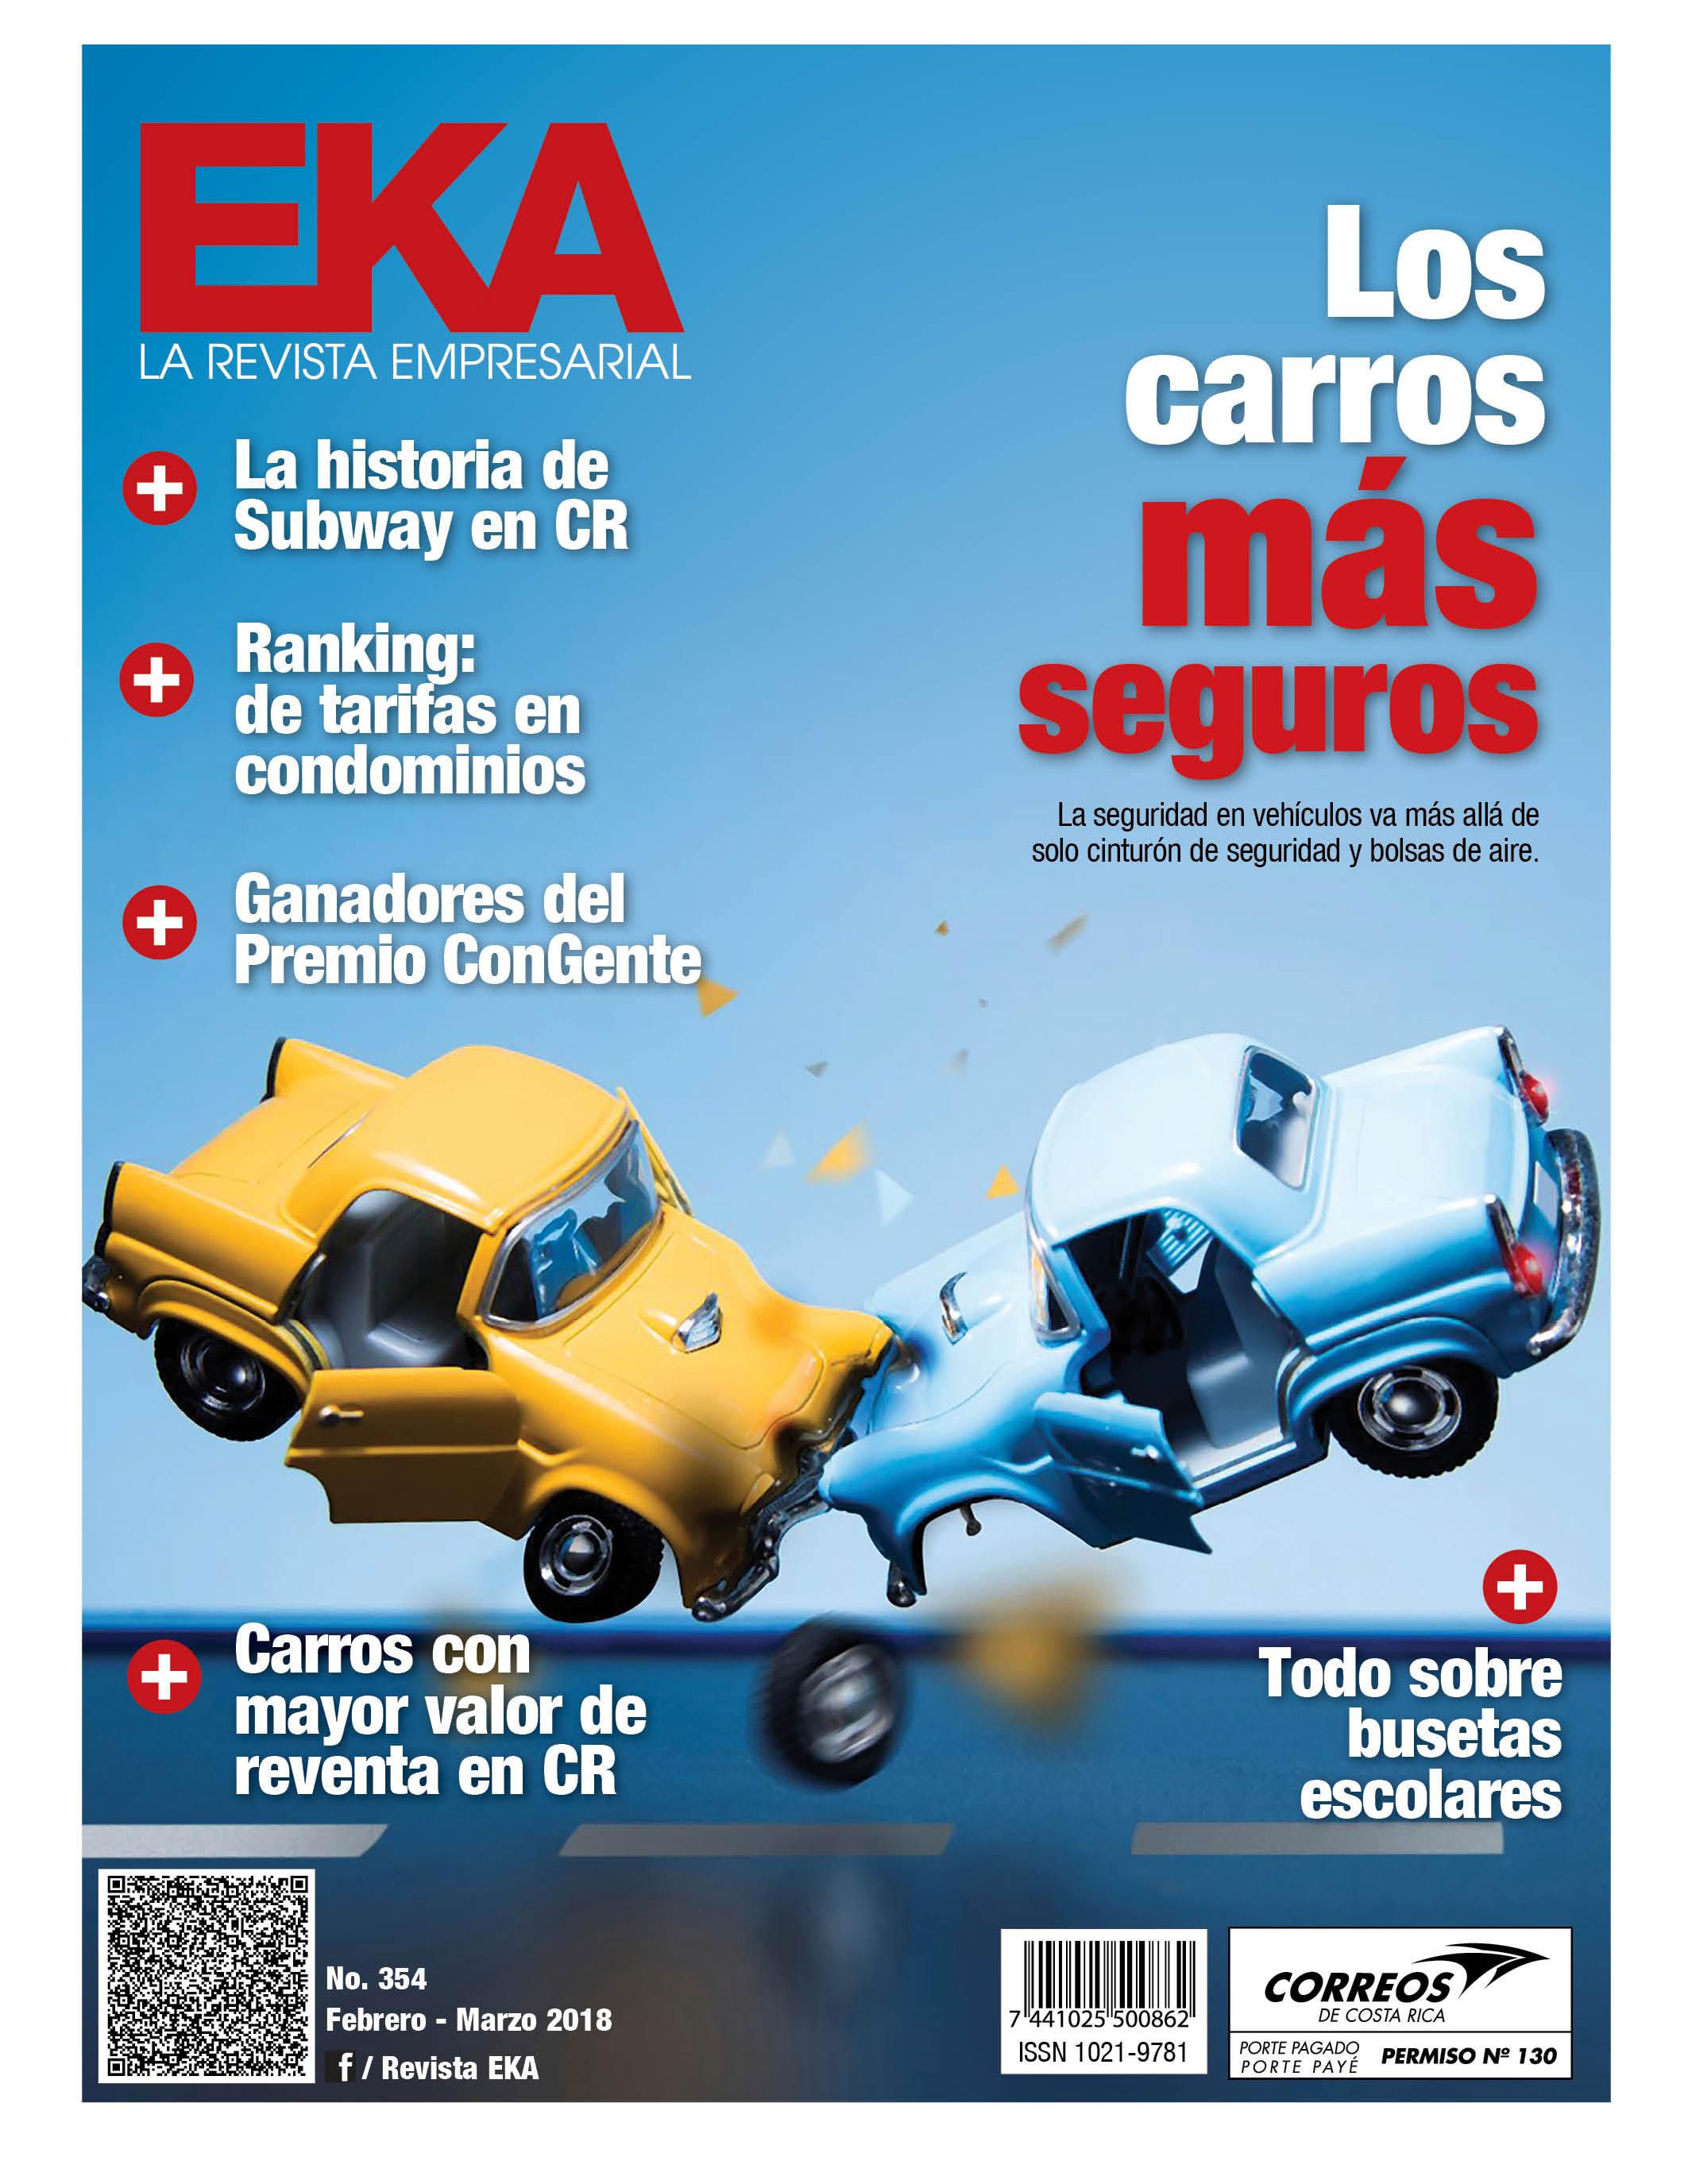 EKA354 portada.jpg